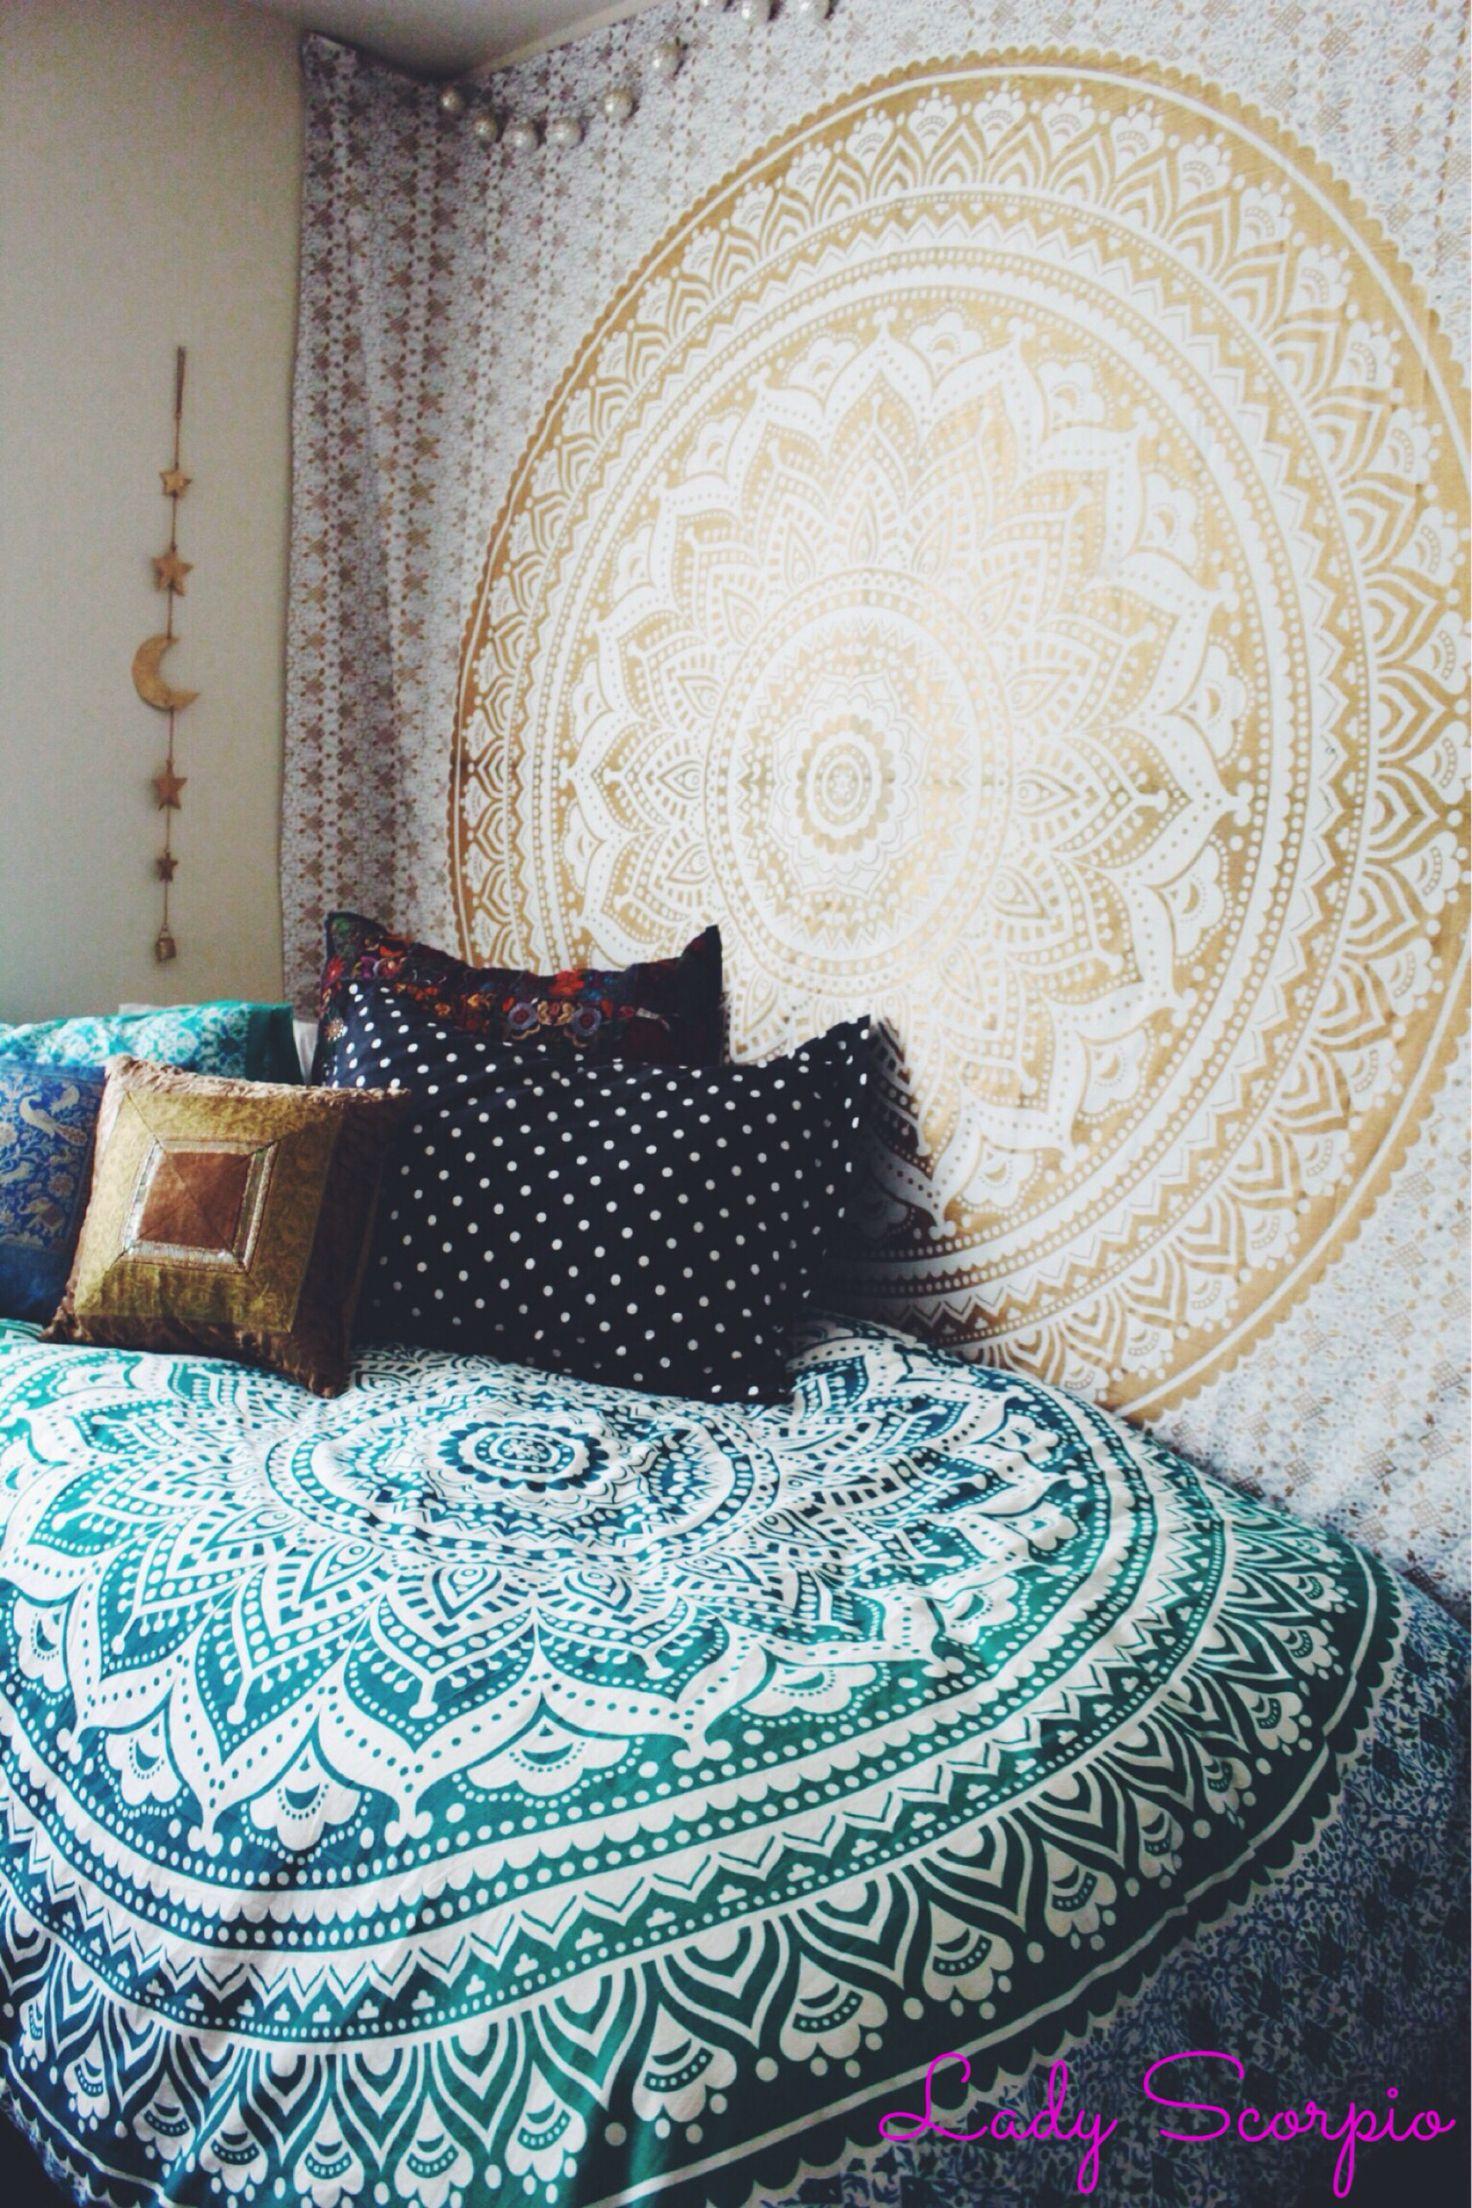 Http Www Cadecga Com Category Tapestry Lady Scorpio